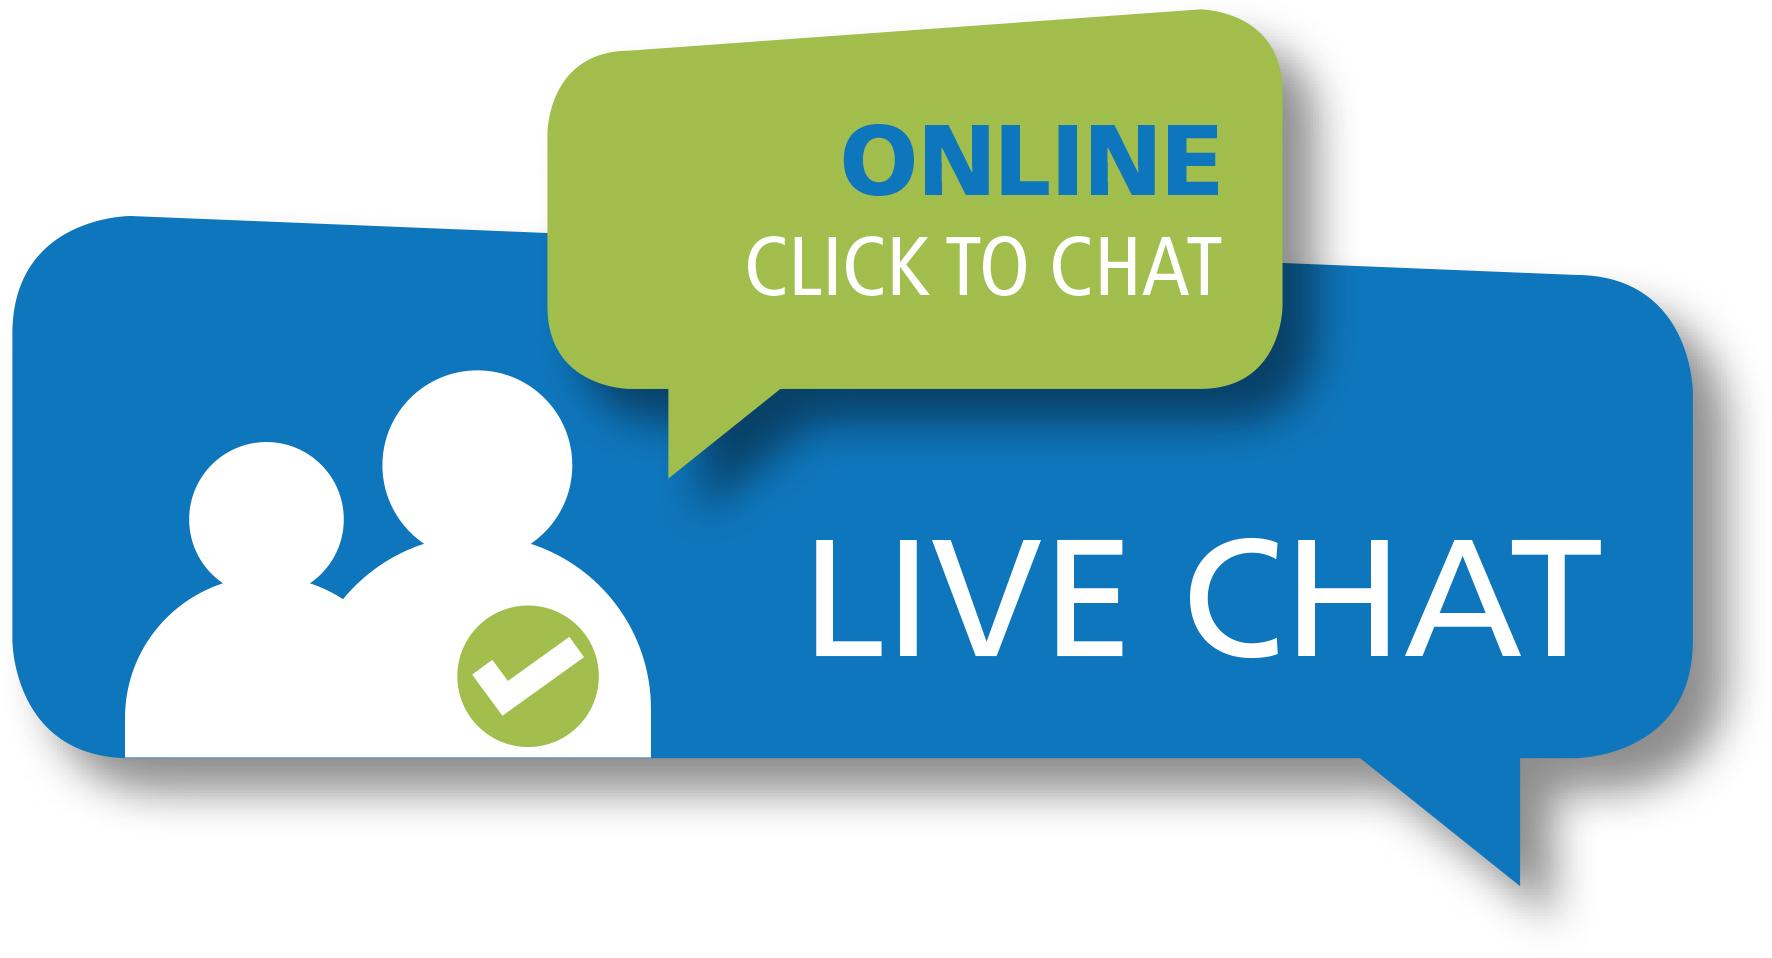 Hm chat online